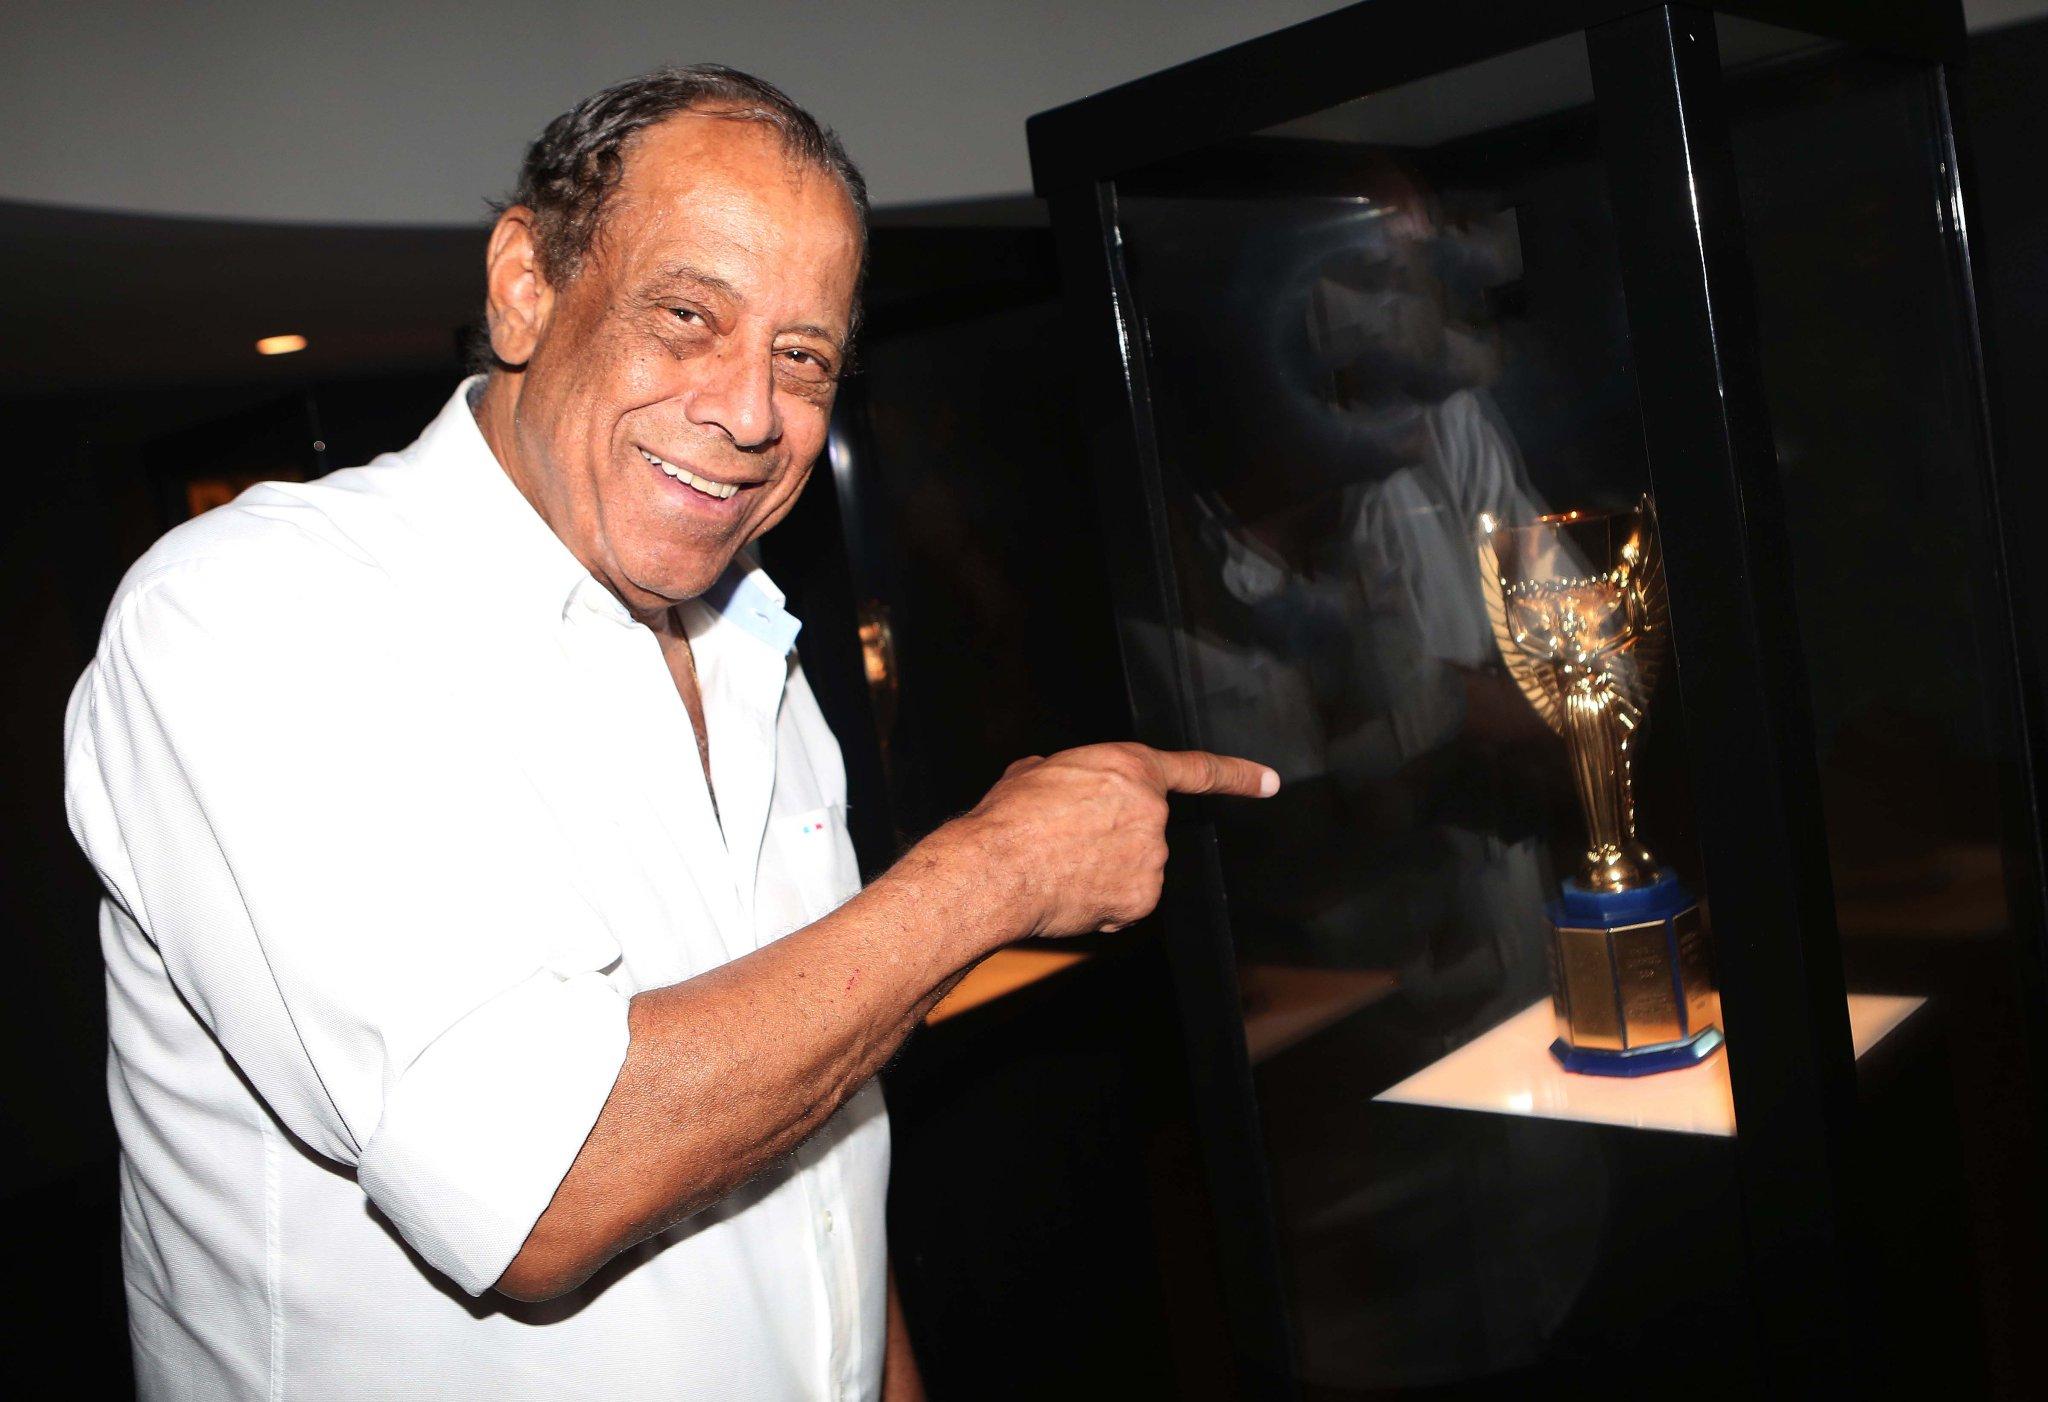 RIP Carlos Alberto: Brazil soccer hero of 1970 World Cup dies at age 72